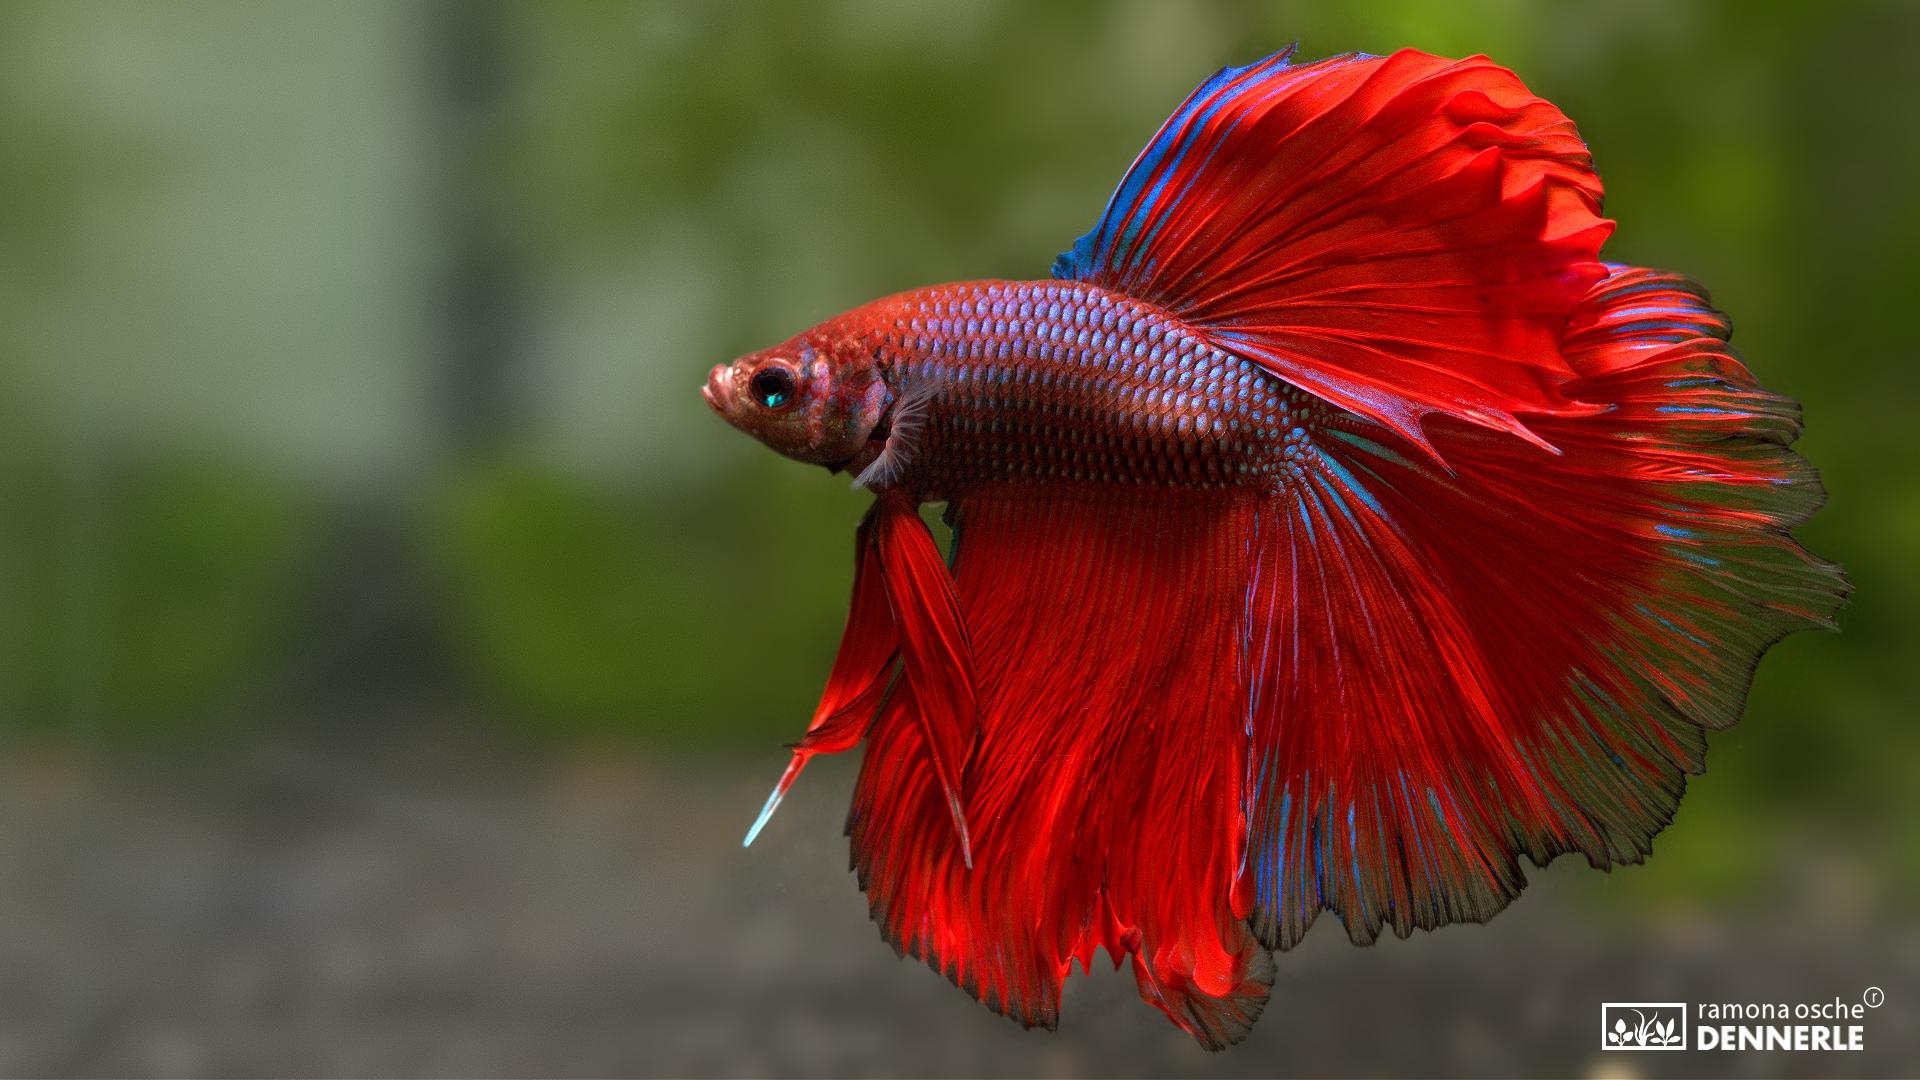 Ramona Osche fish natural shots 1920x1080